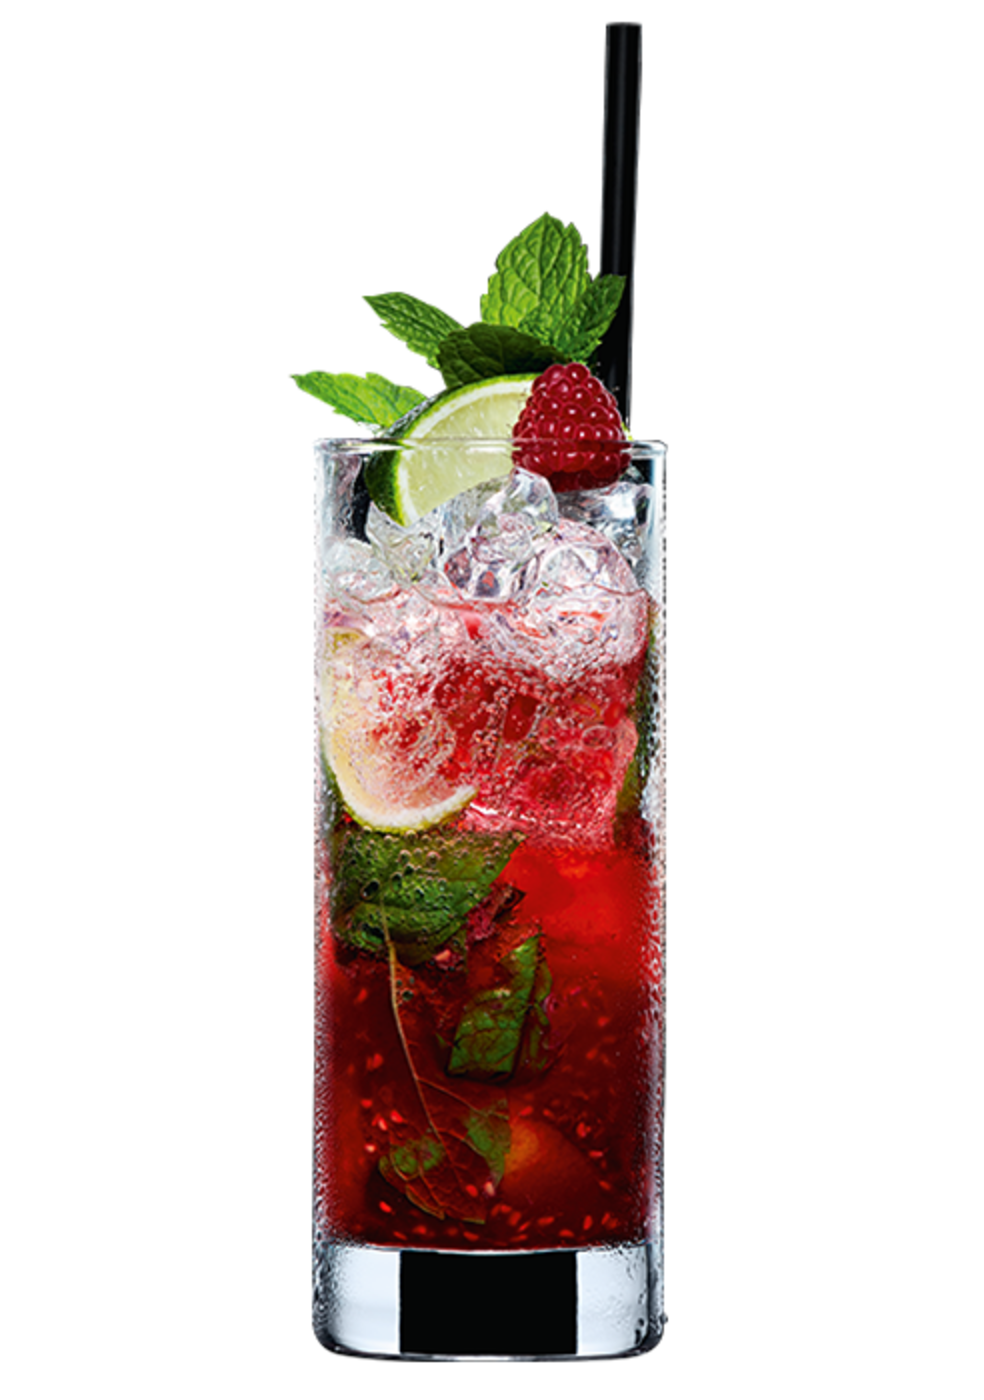 Virgin Raspberry Mojito Rezept Schweppes Cocktails Rezept Getranke Weihnachten Alkoholfreie Cocktails Gin Cocktail Rezepte